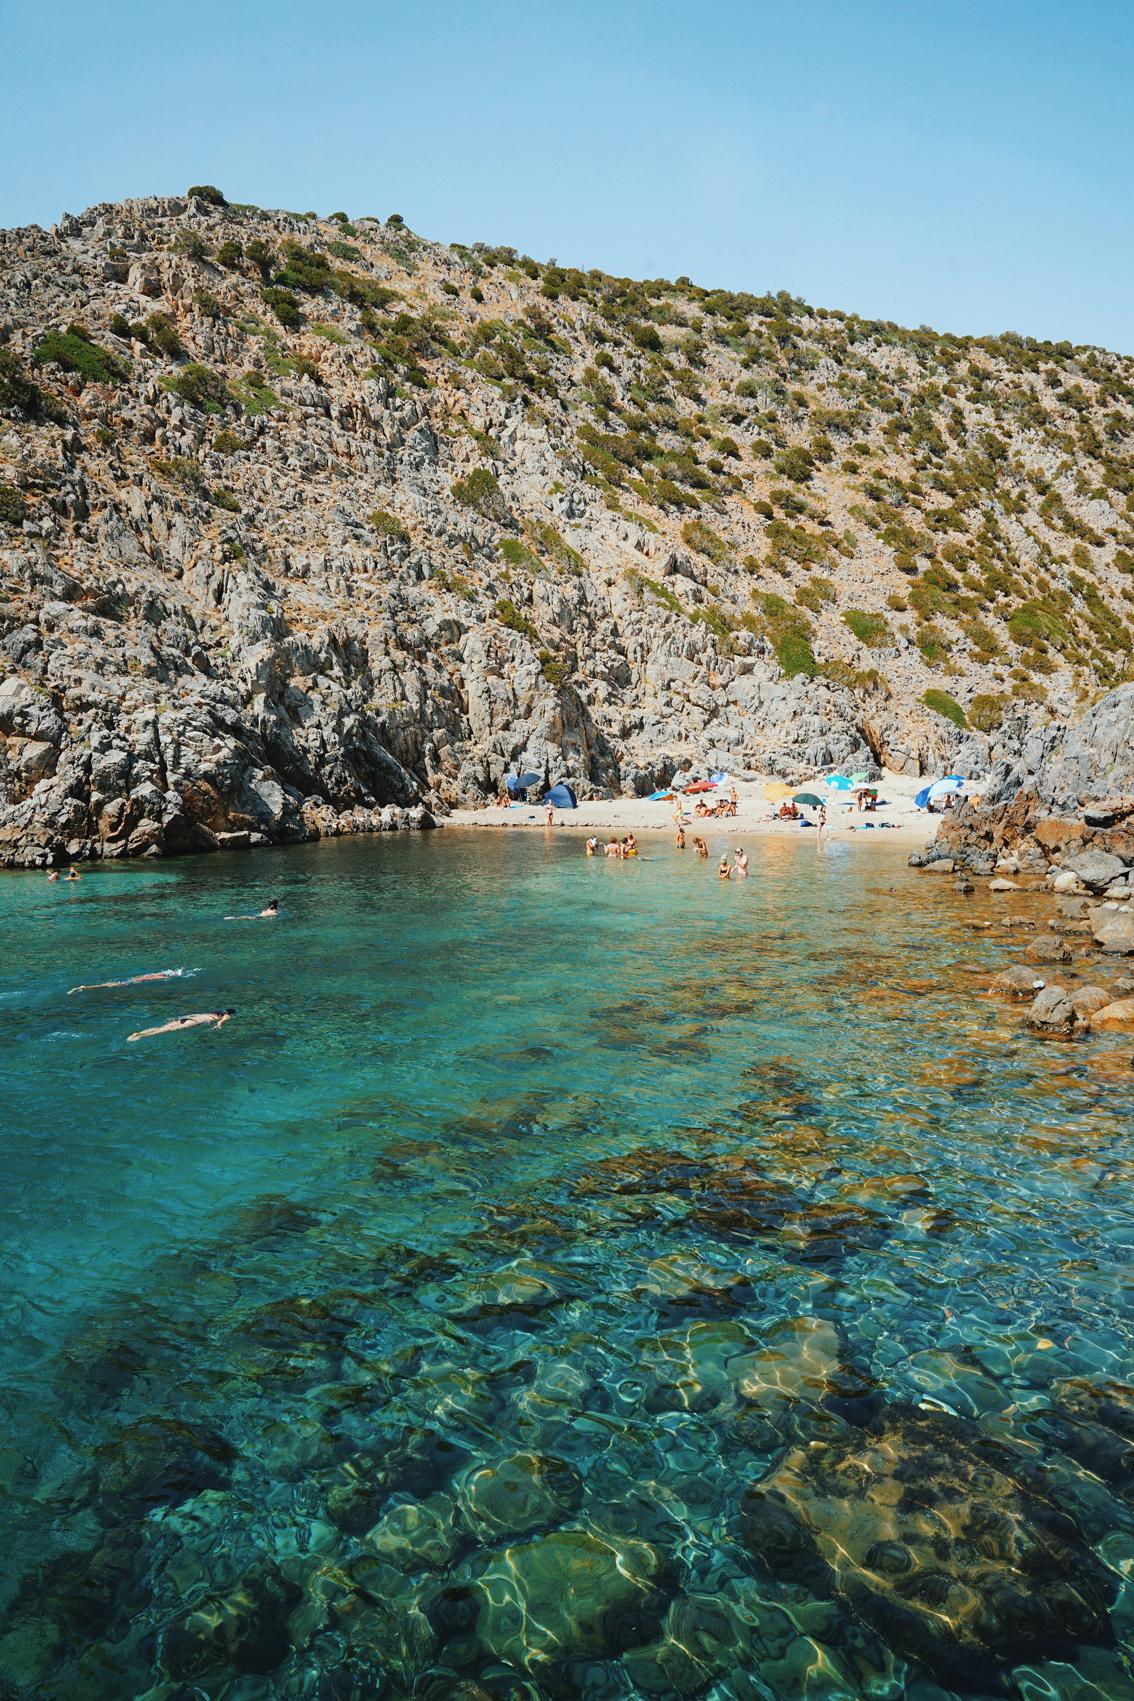 20 2 days in Cagliari ( Sardinia ), where to sleep to discover the best beaches.